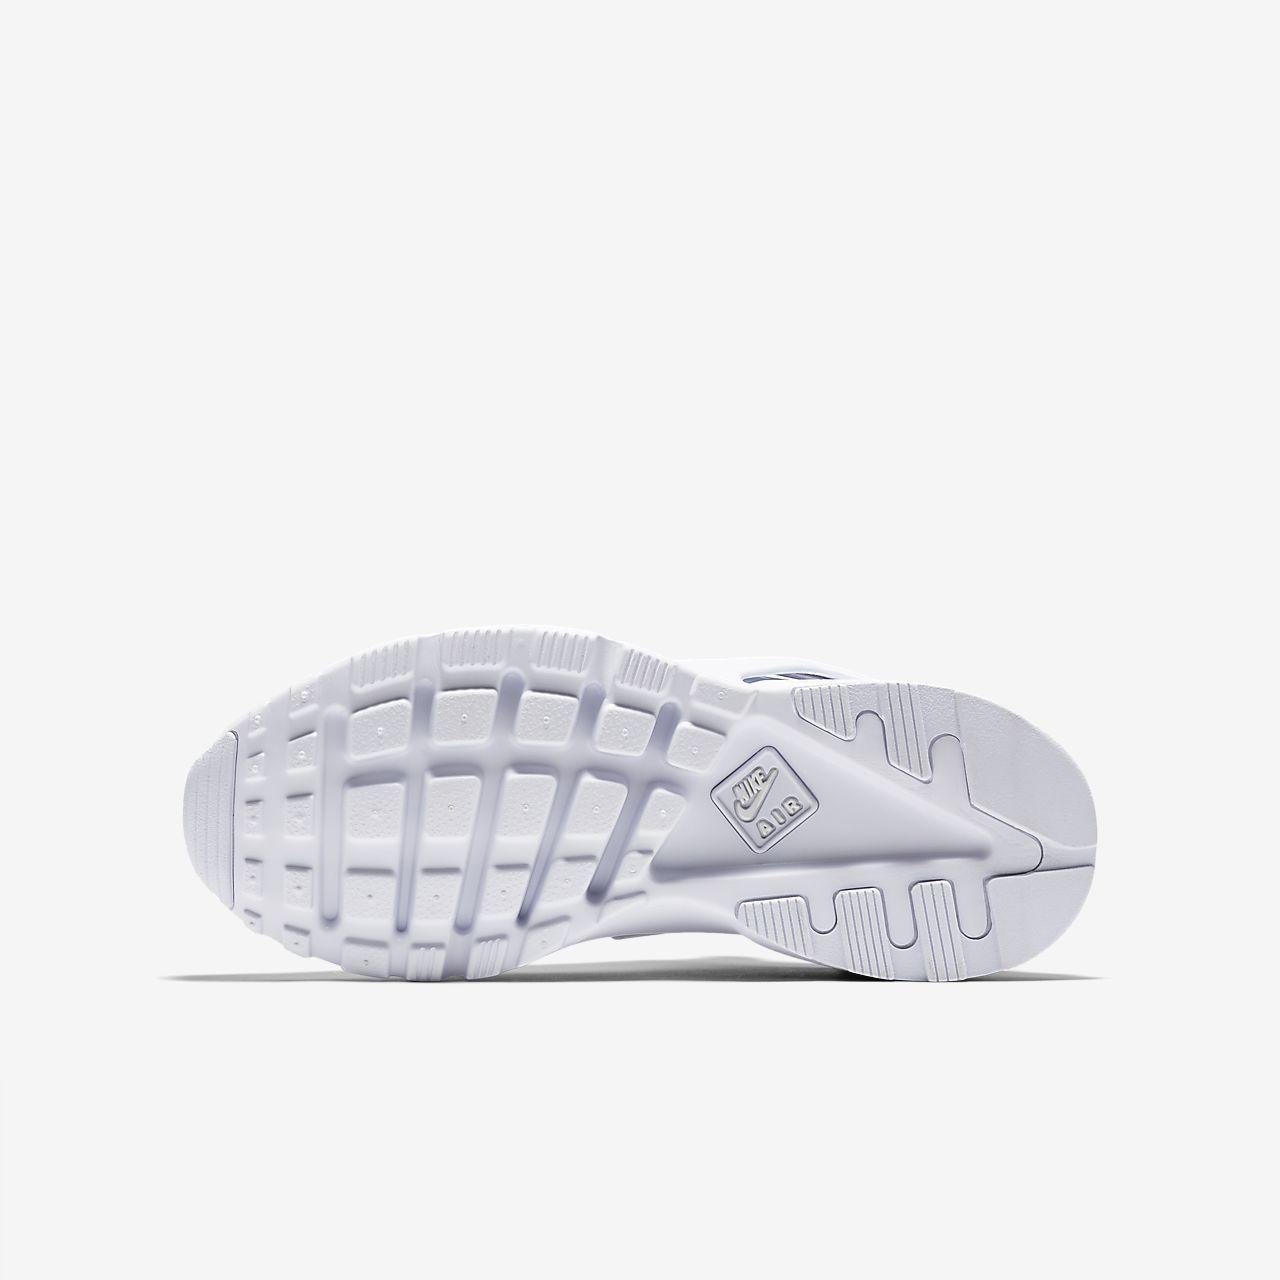 be0c4fbedfd Παπούτσι Nike Air Huarache Ultra για μεγάλα παιδιά. Nike.com GR